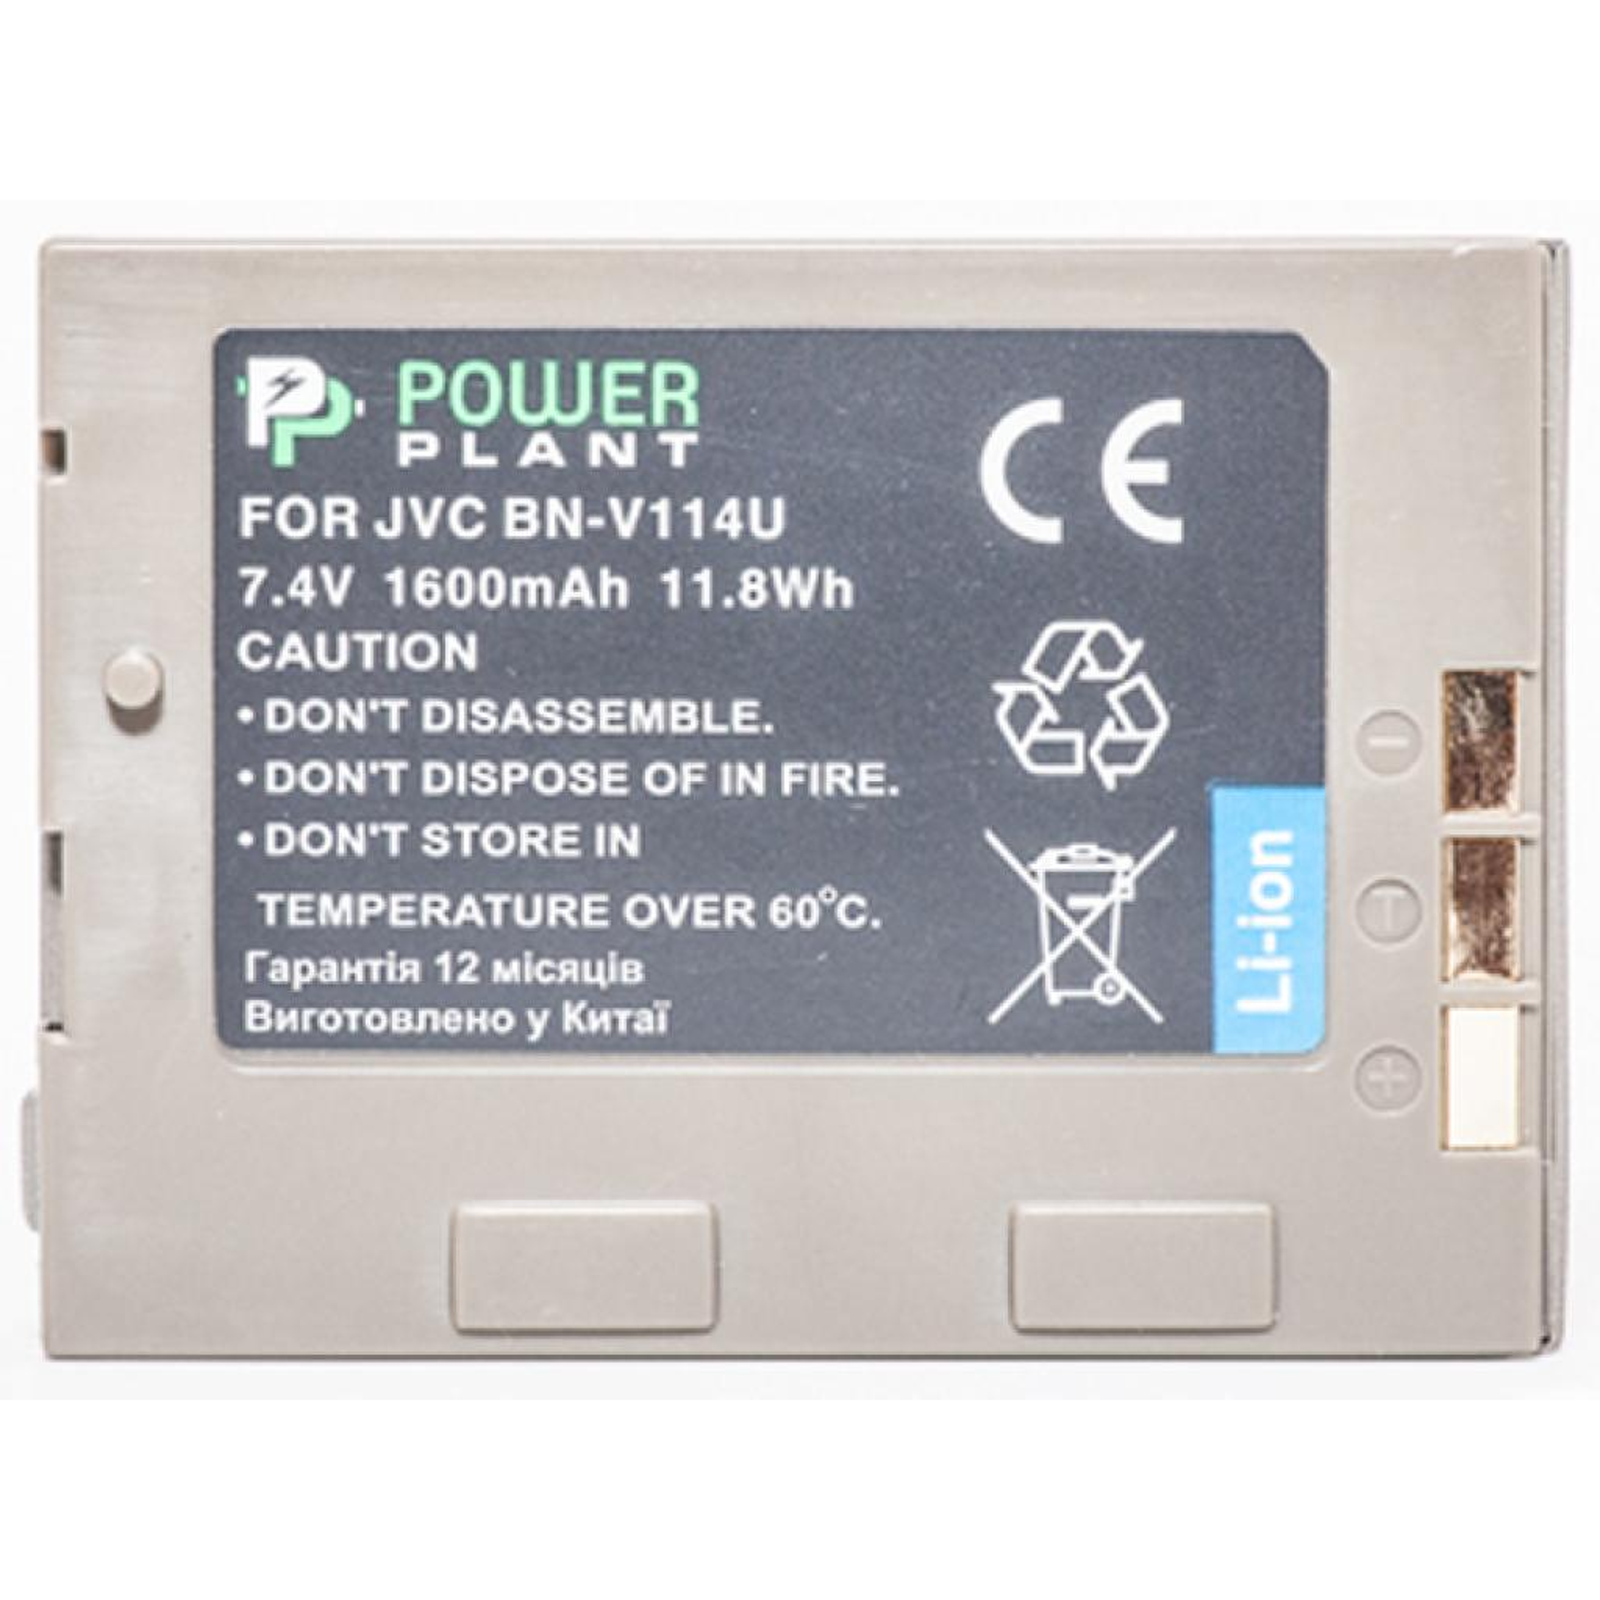 Аккумулятор к фото/видео PowerPlant JVC BN-V114U (DV00DV1356) изображение 2